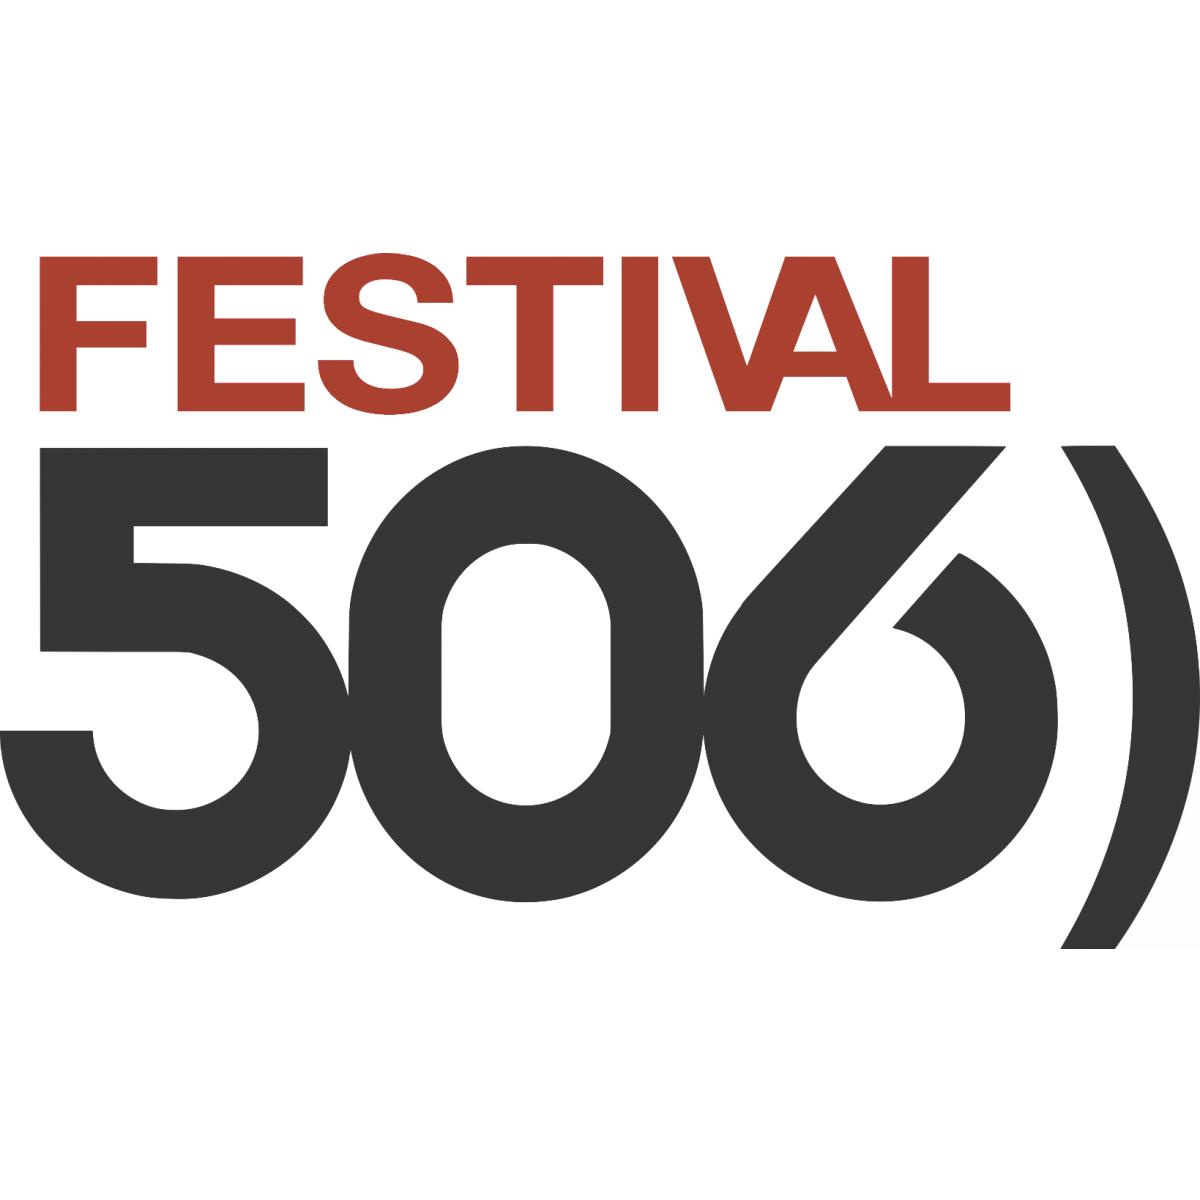 Festival (506) Image